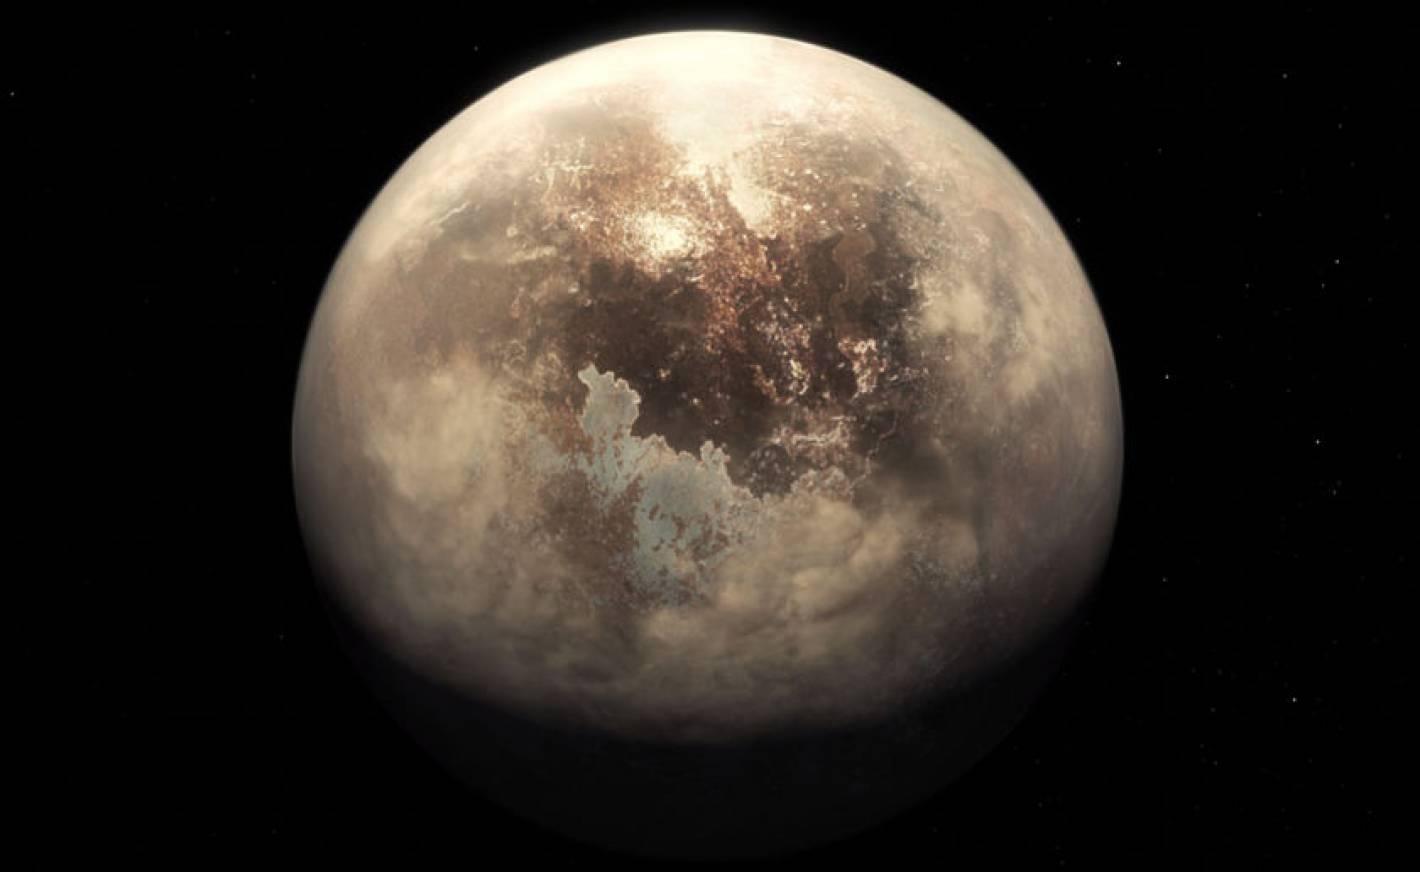 Chile encontr el segundo planeta m s cercano y habitable for Correo postal mas cercano